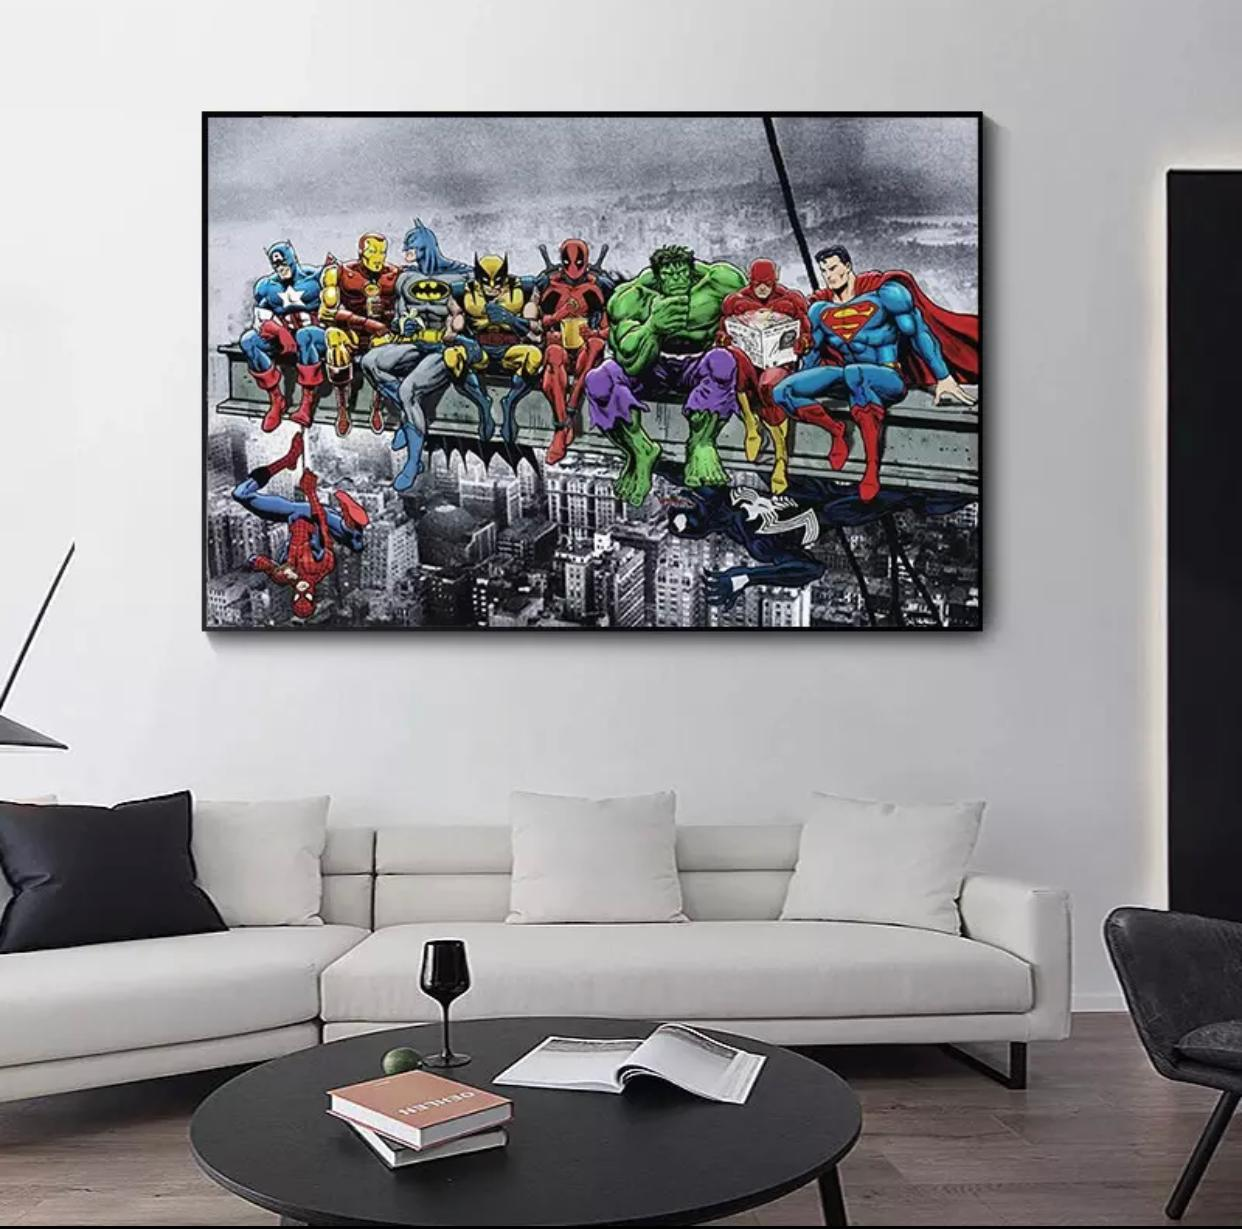 Quadro Canvas Sem Moldura 60x80 Marvel DC Superheroes Empire State Buildin Workers - EV